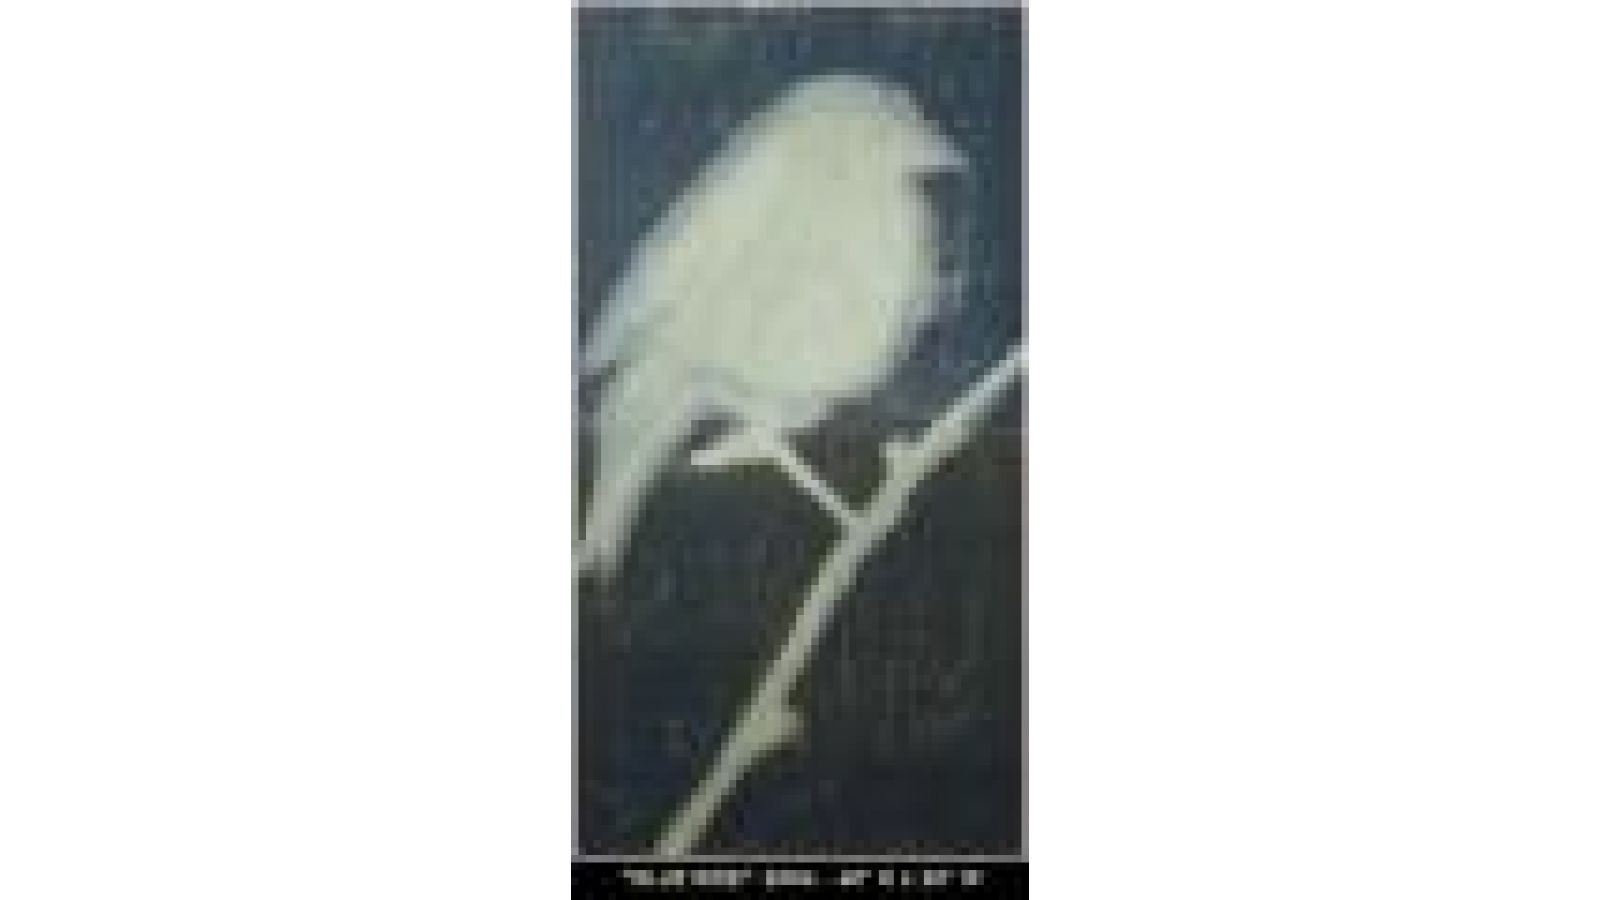 bluebirdalone